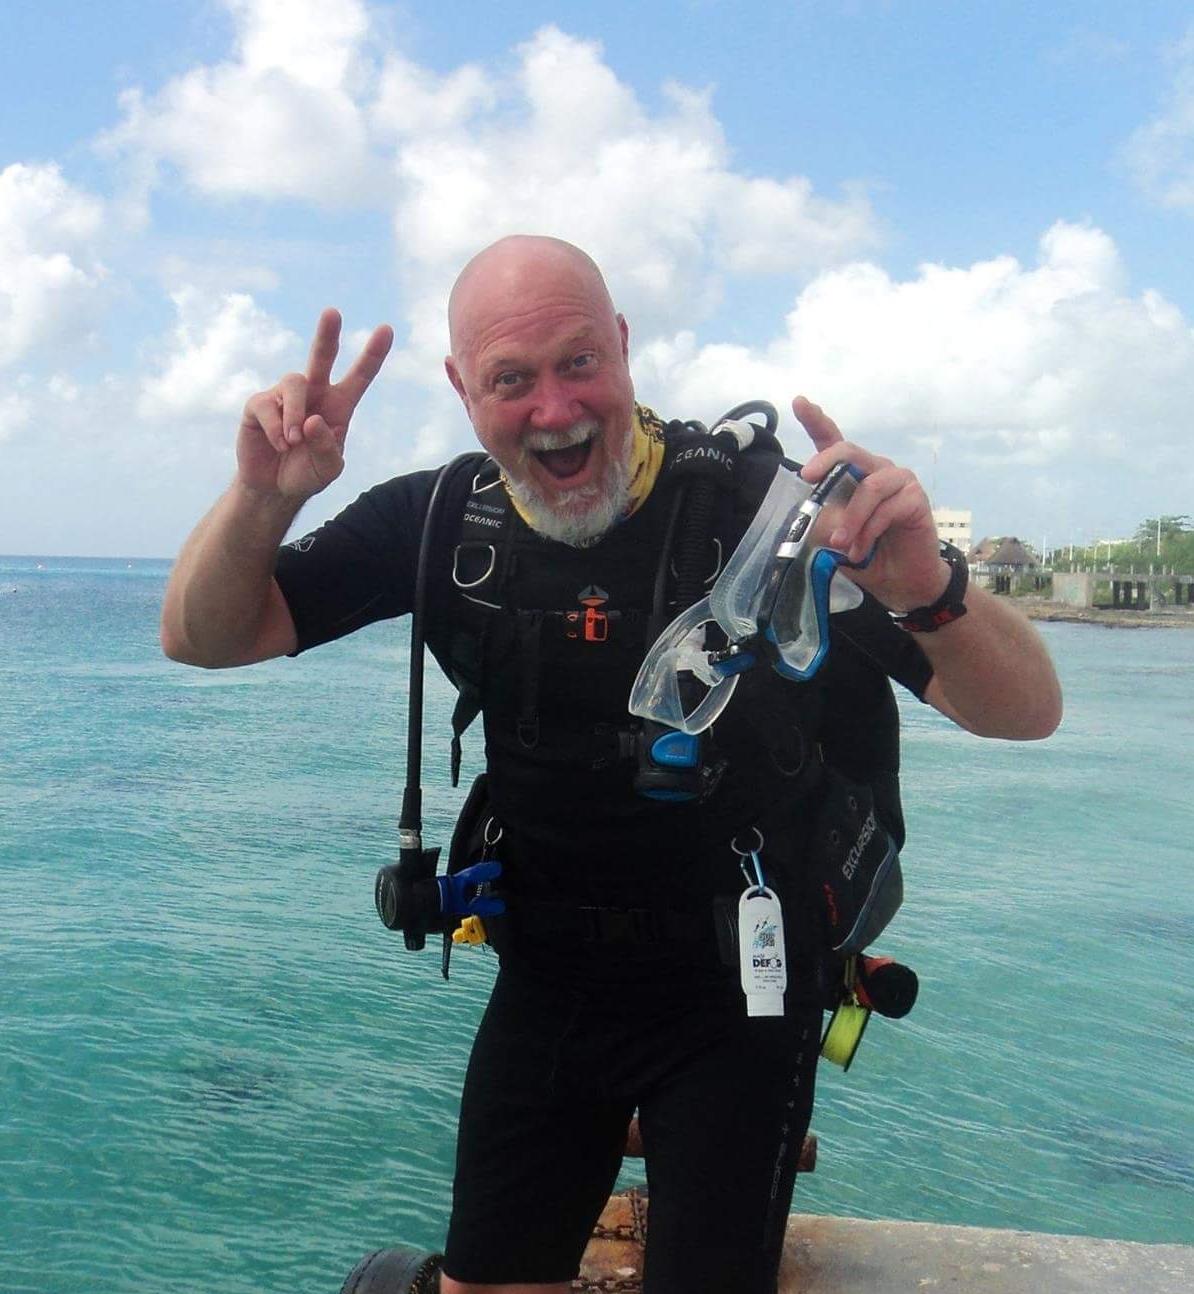 PADI IDC Staff Instructor Kendal Larson